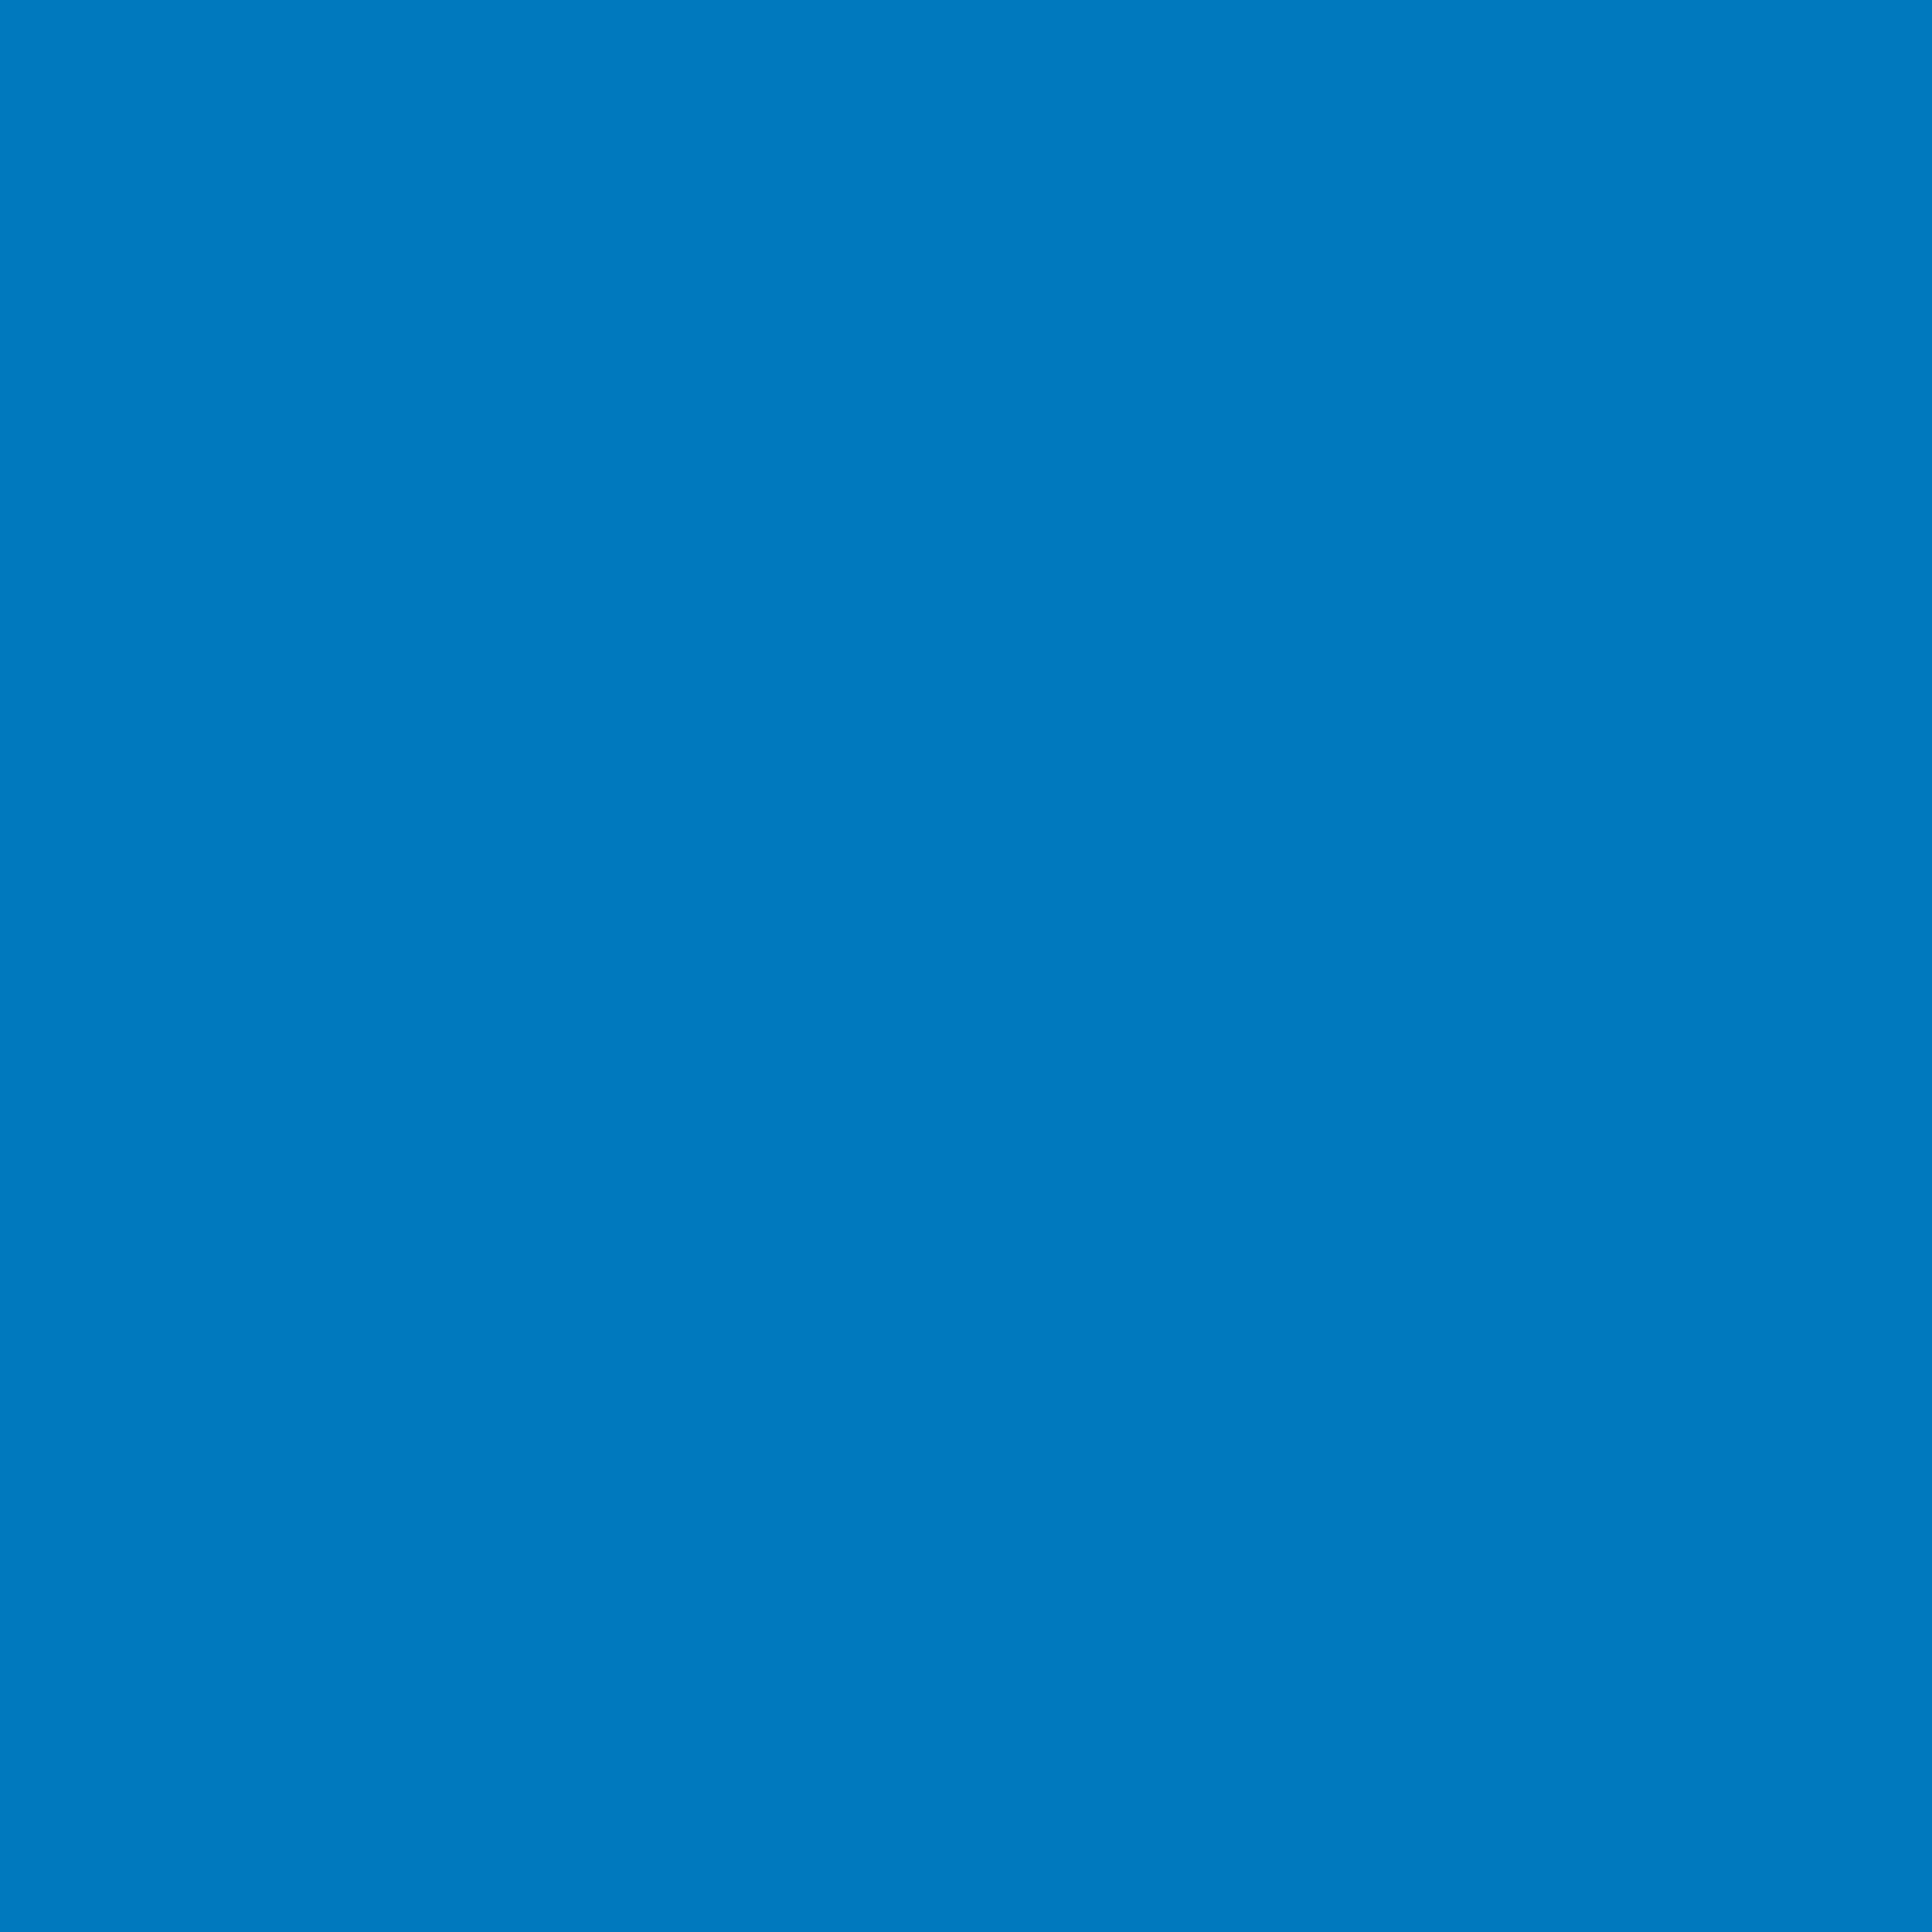 2048x2048 Ocean Boat Blue Solid Color Background